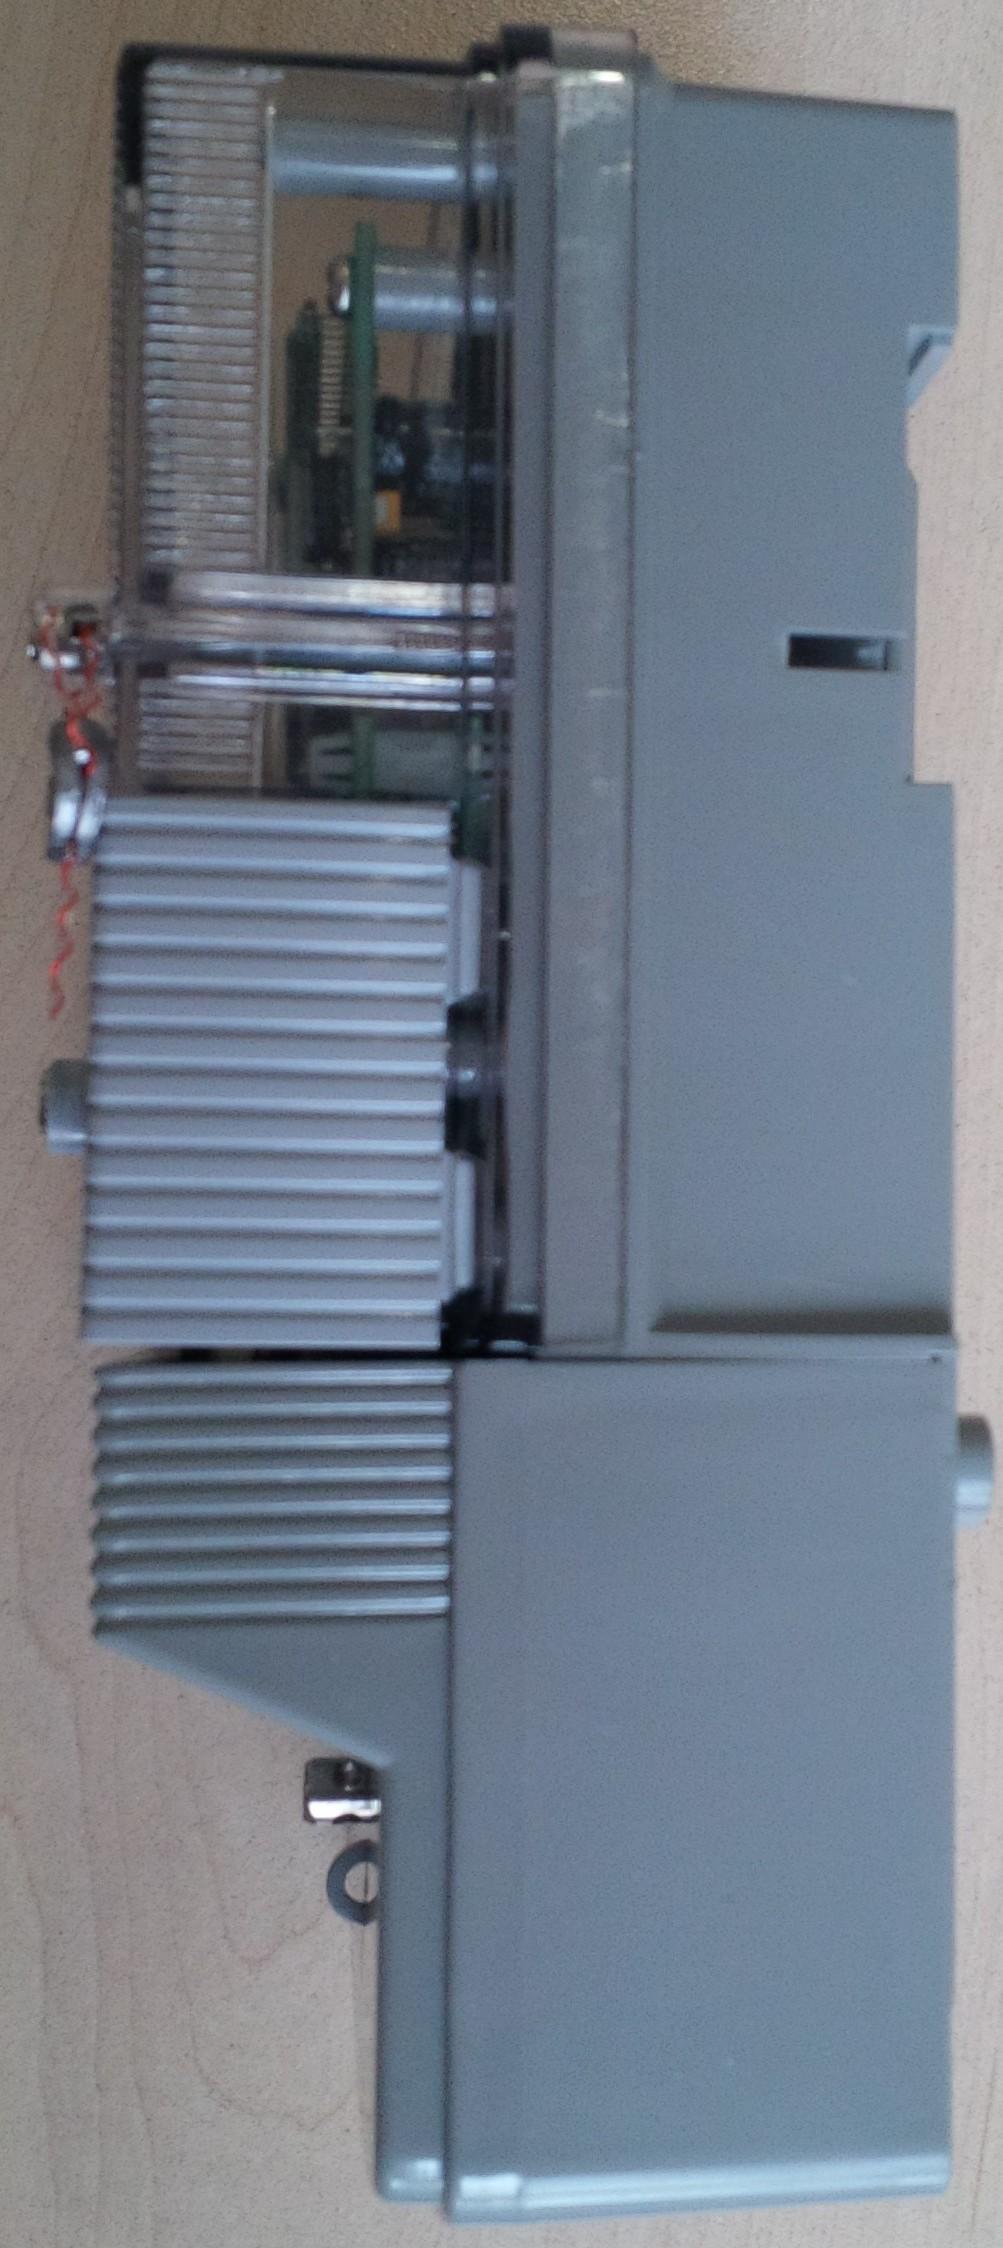 схема подключения электросчетчика цэ 680бк